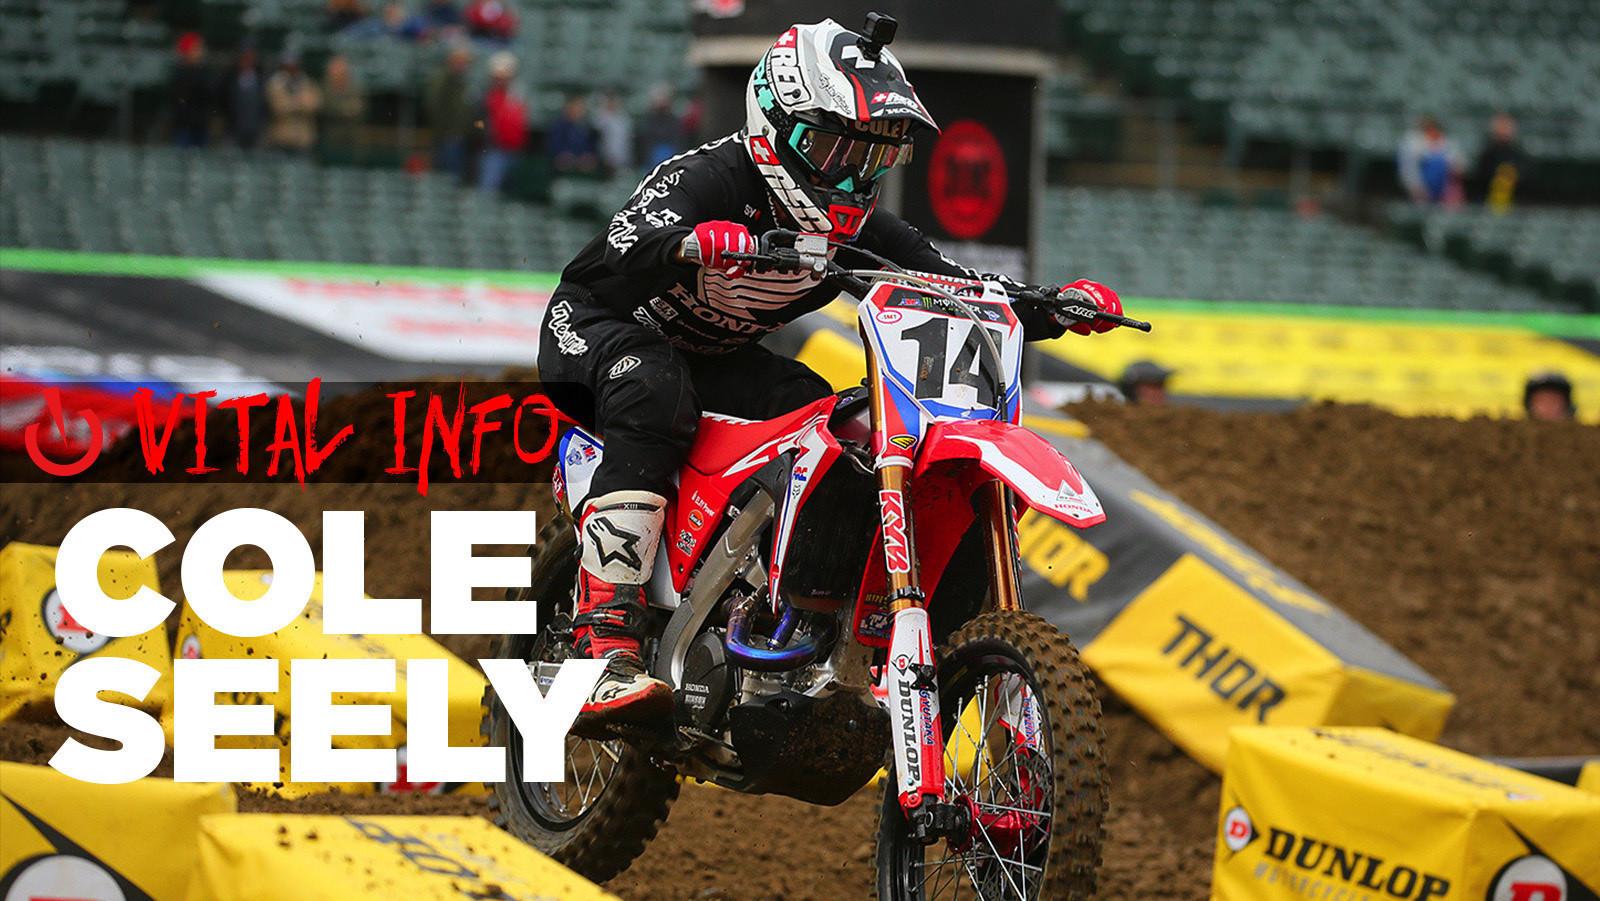 Vital Info: Cole Seely